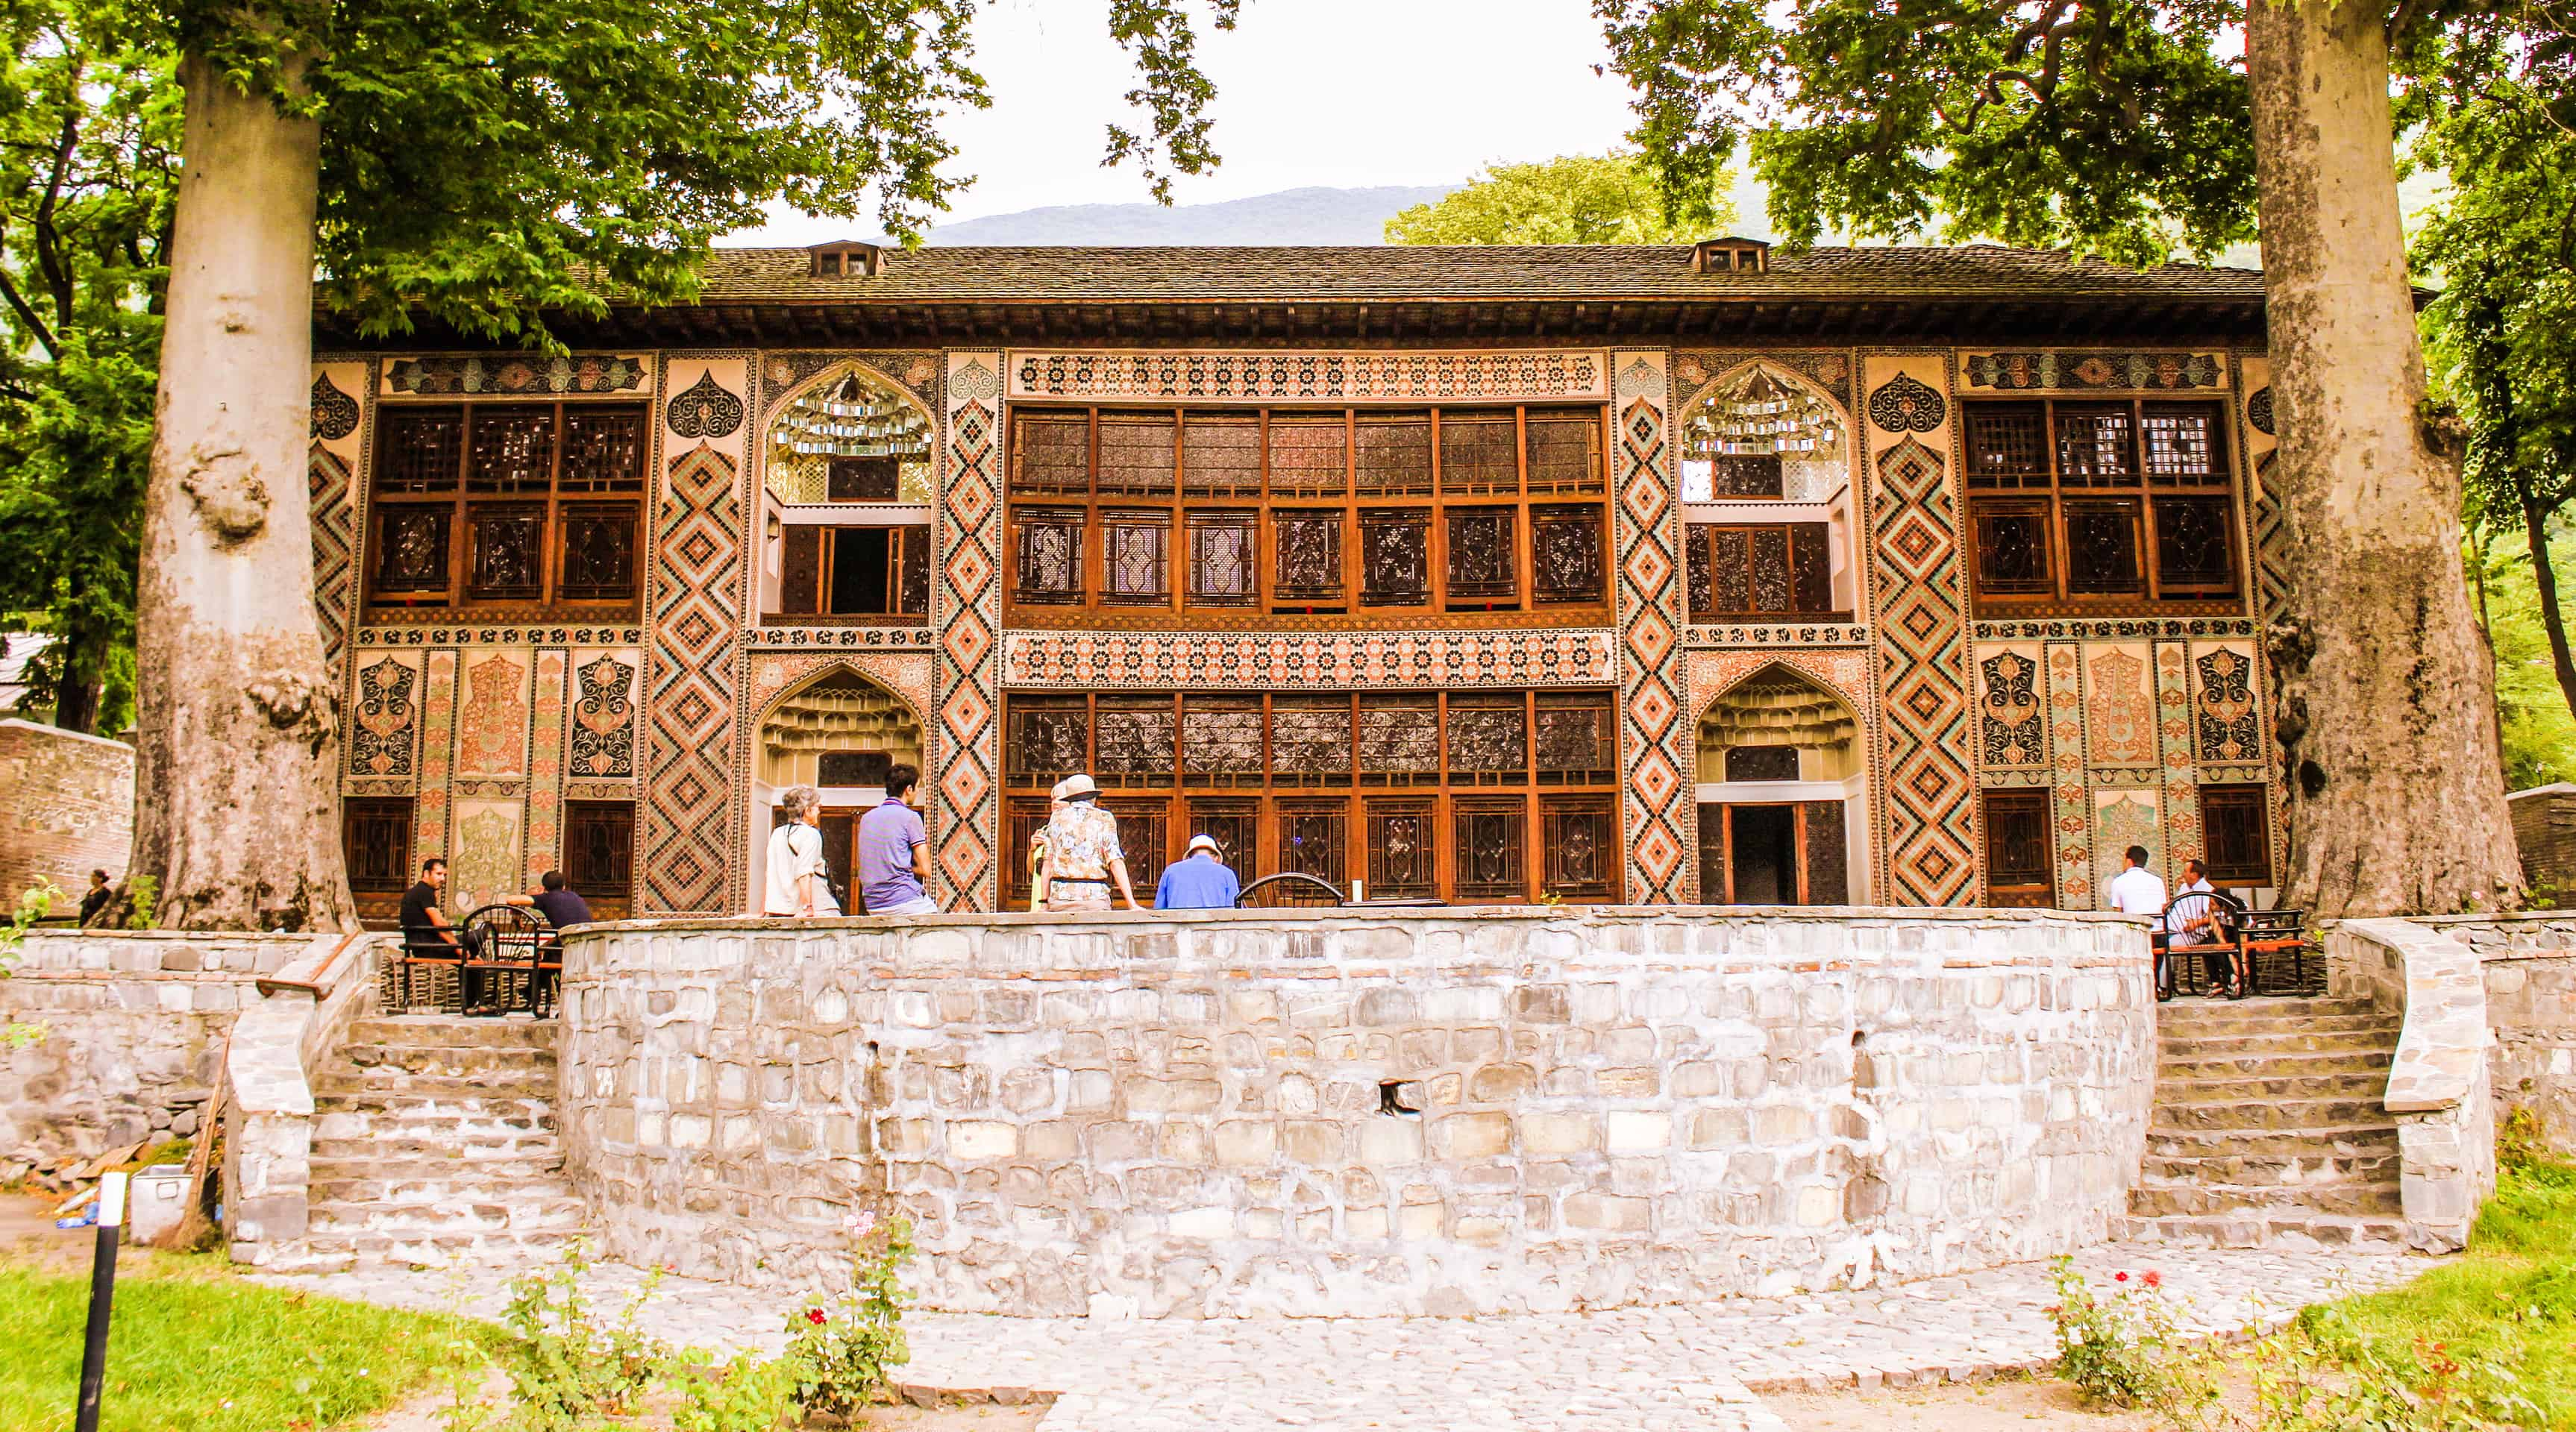 Facade of the Khan's Palace, Sheki, Azerbaijan